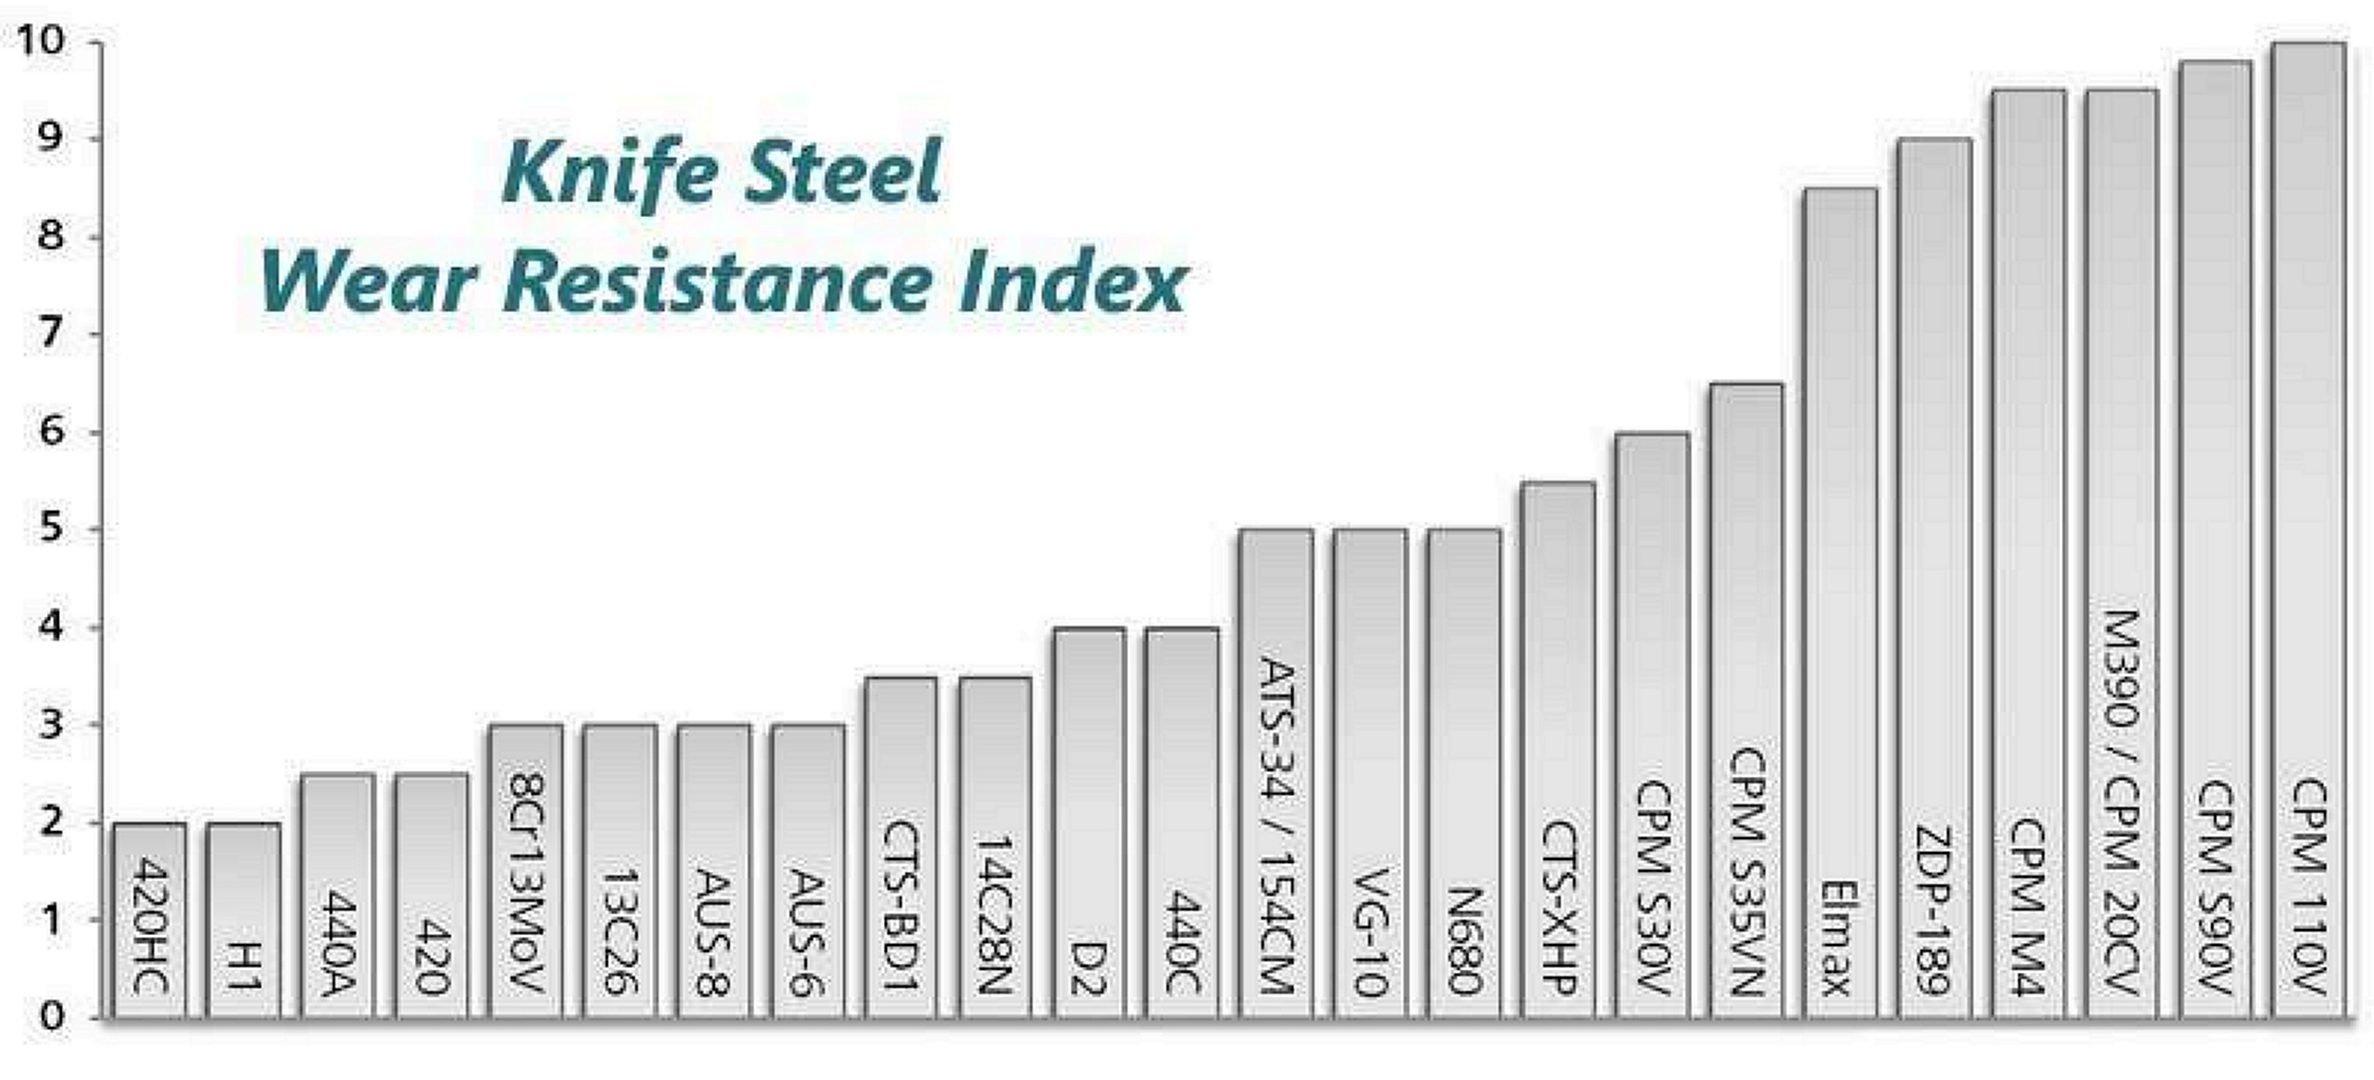 metal wear resistance index